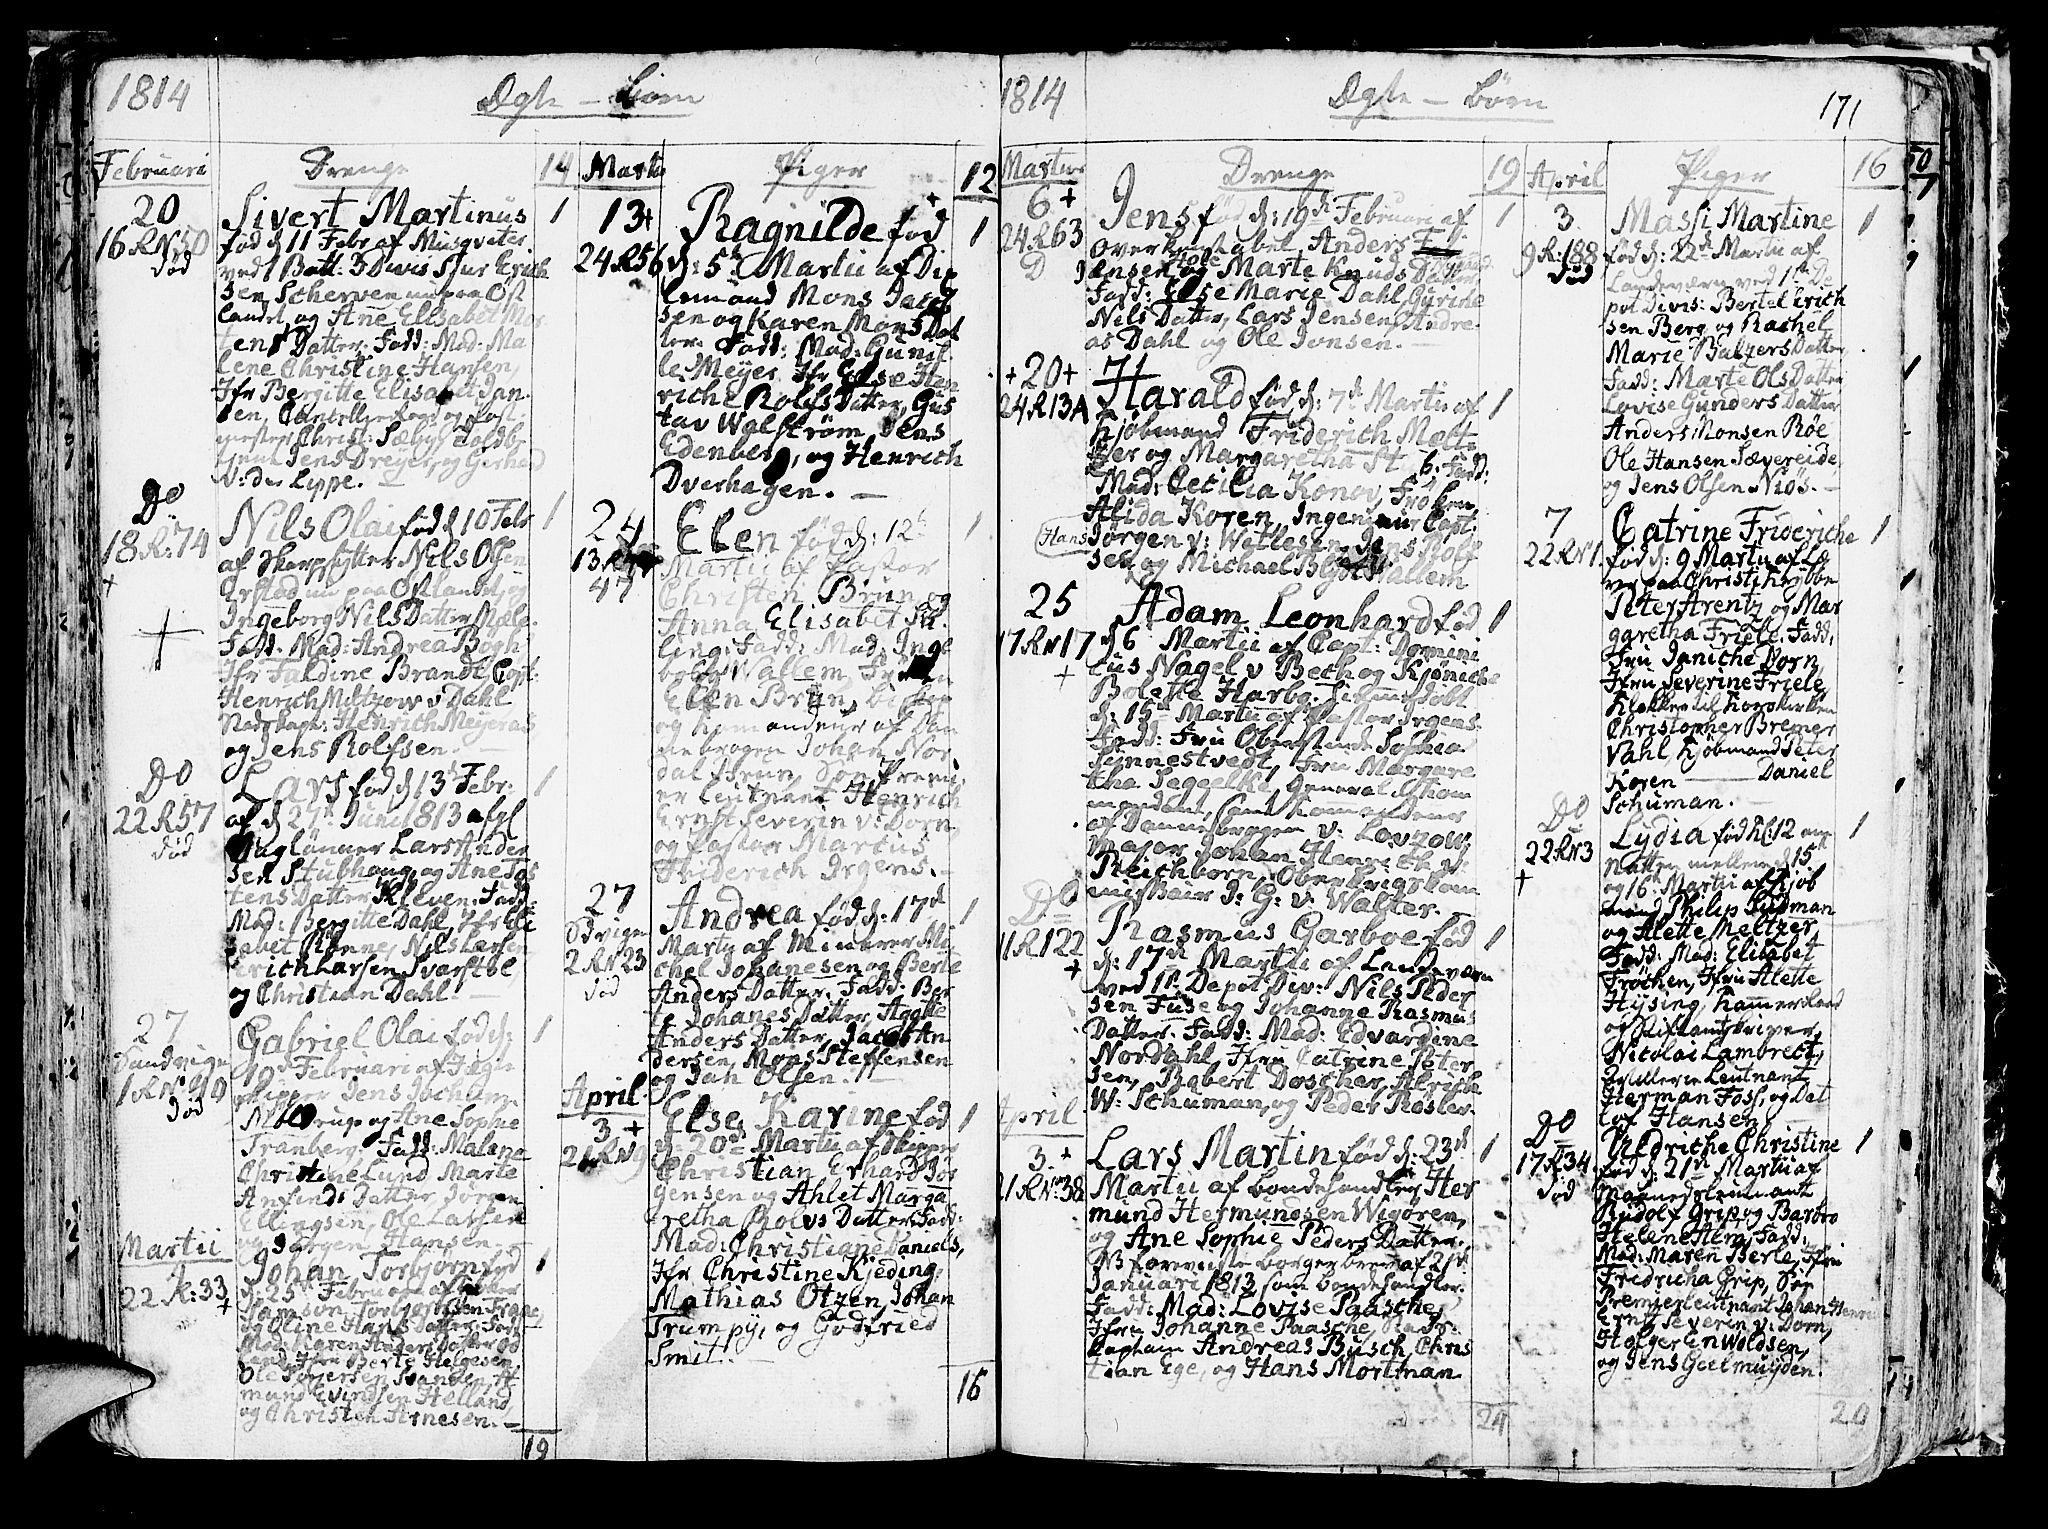 SAB, Korskirken Sokneprestembete, H/Haa/L0006: Ministerialbok nr. A 6, 1790-1820, s. 171